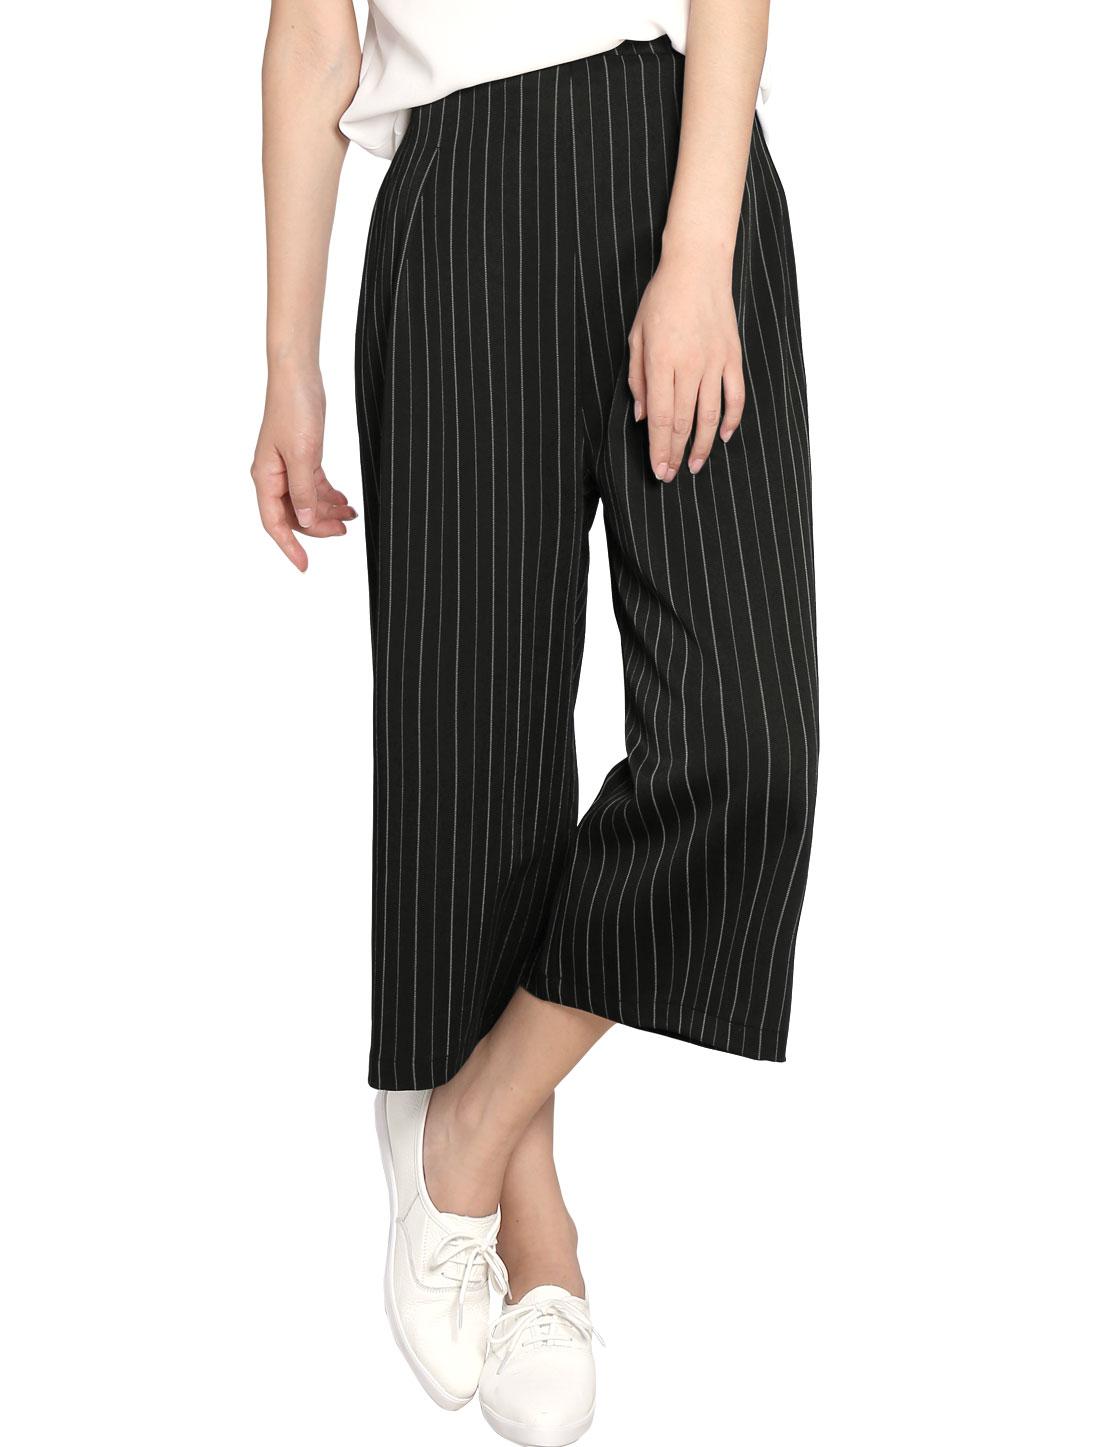 Women Capris Vertical Stripes Wide Leg Pants Black XS